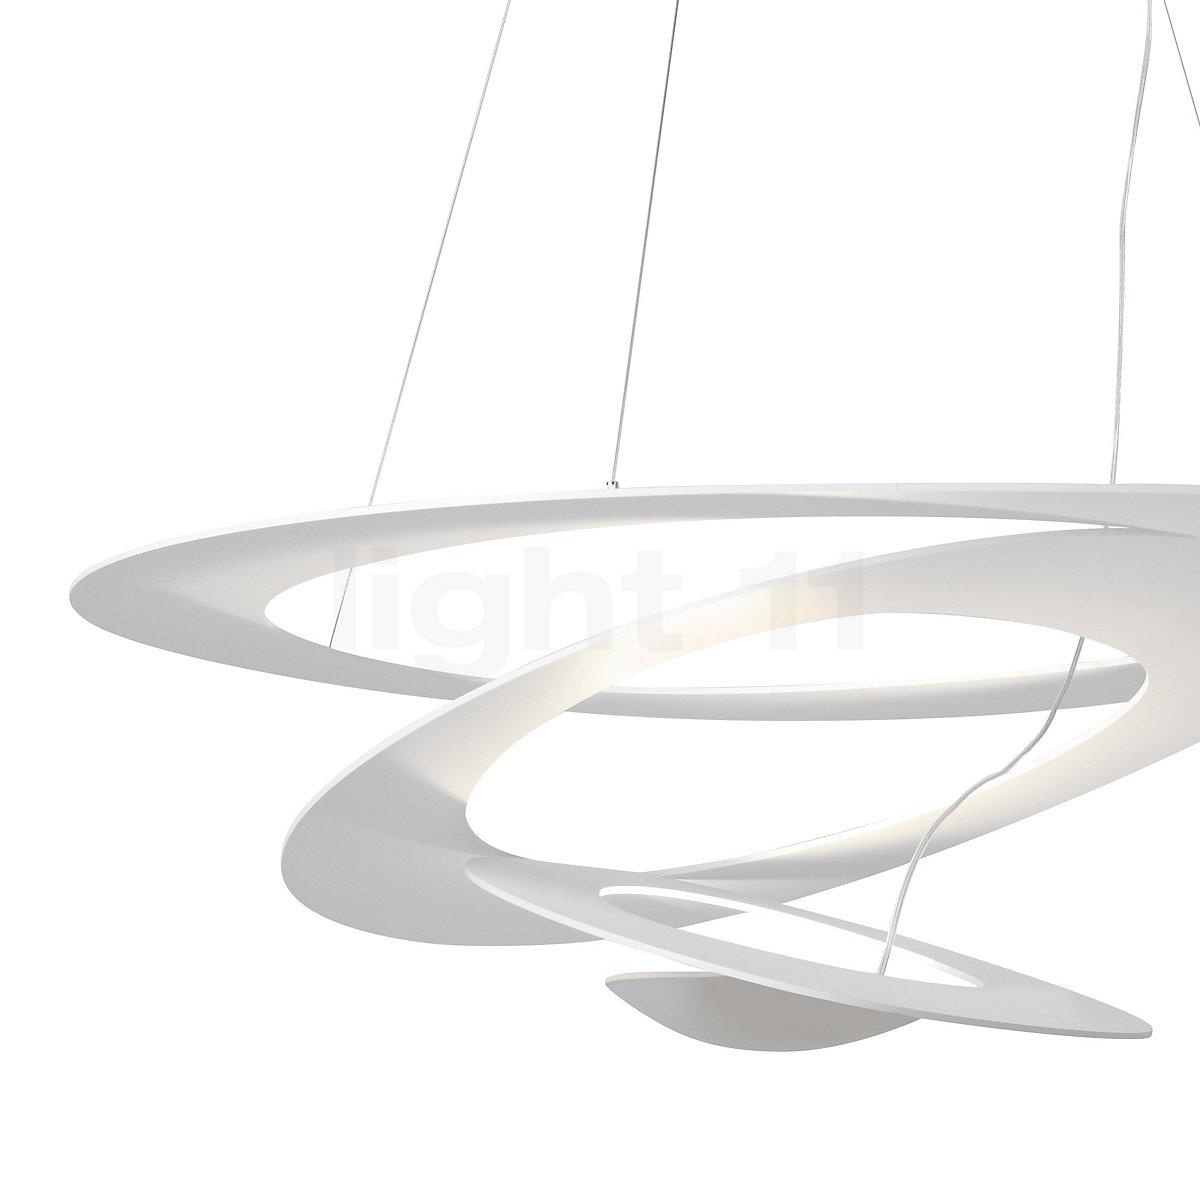 4 hue lampen nebeneinander